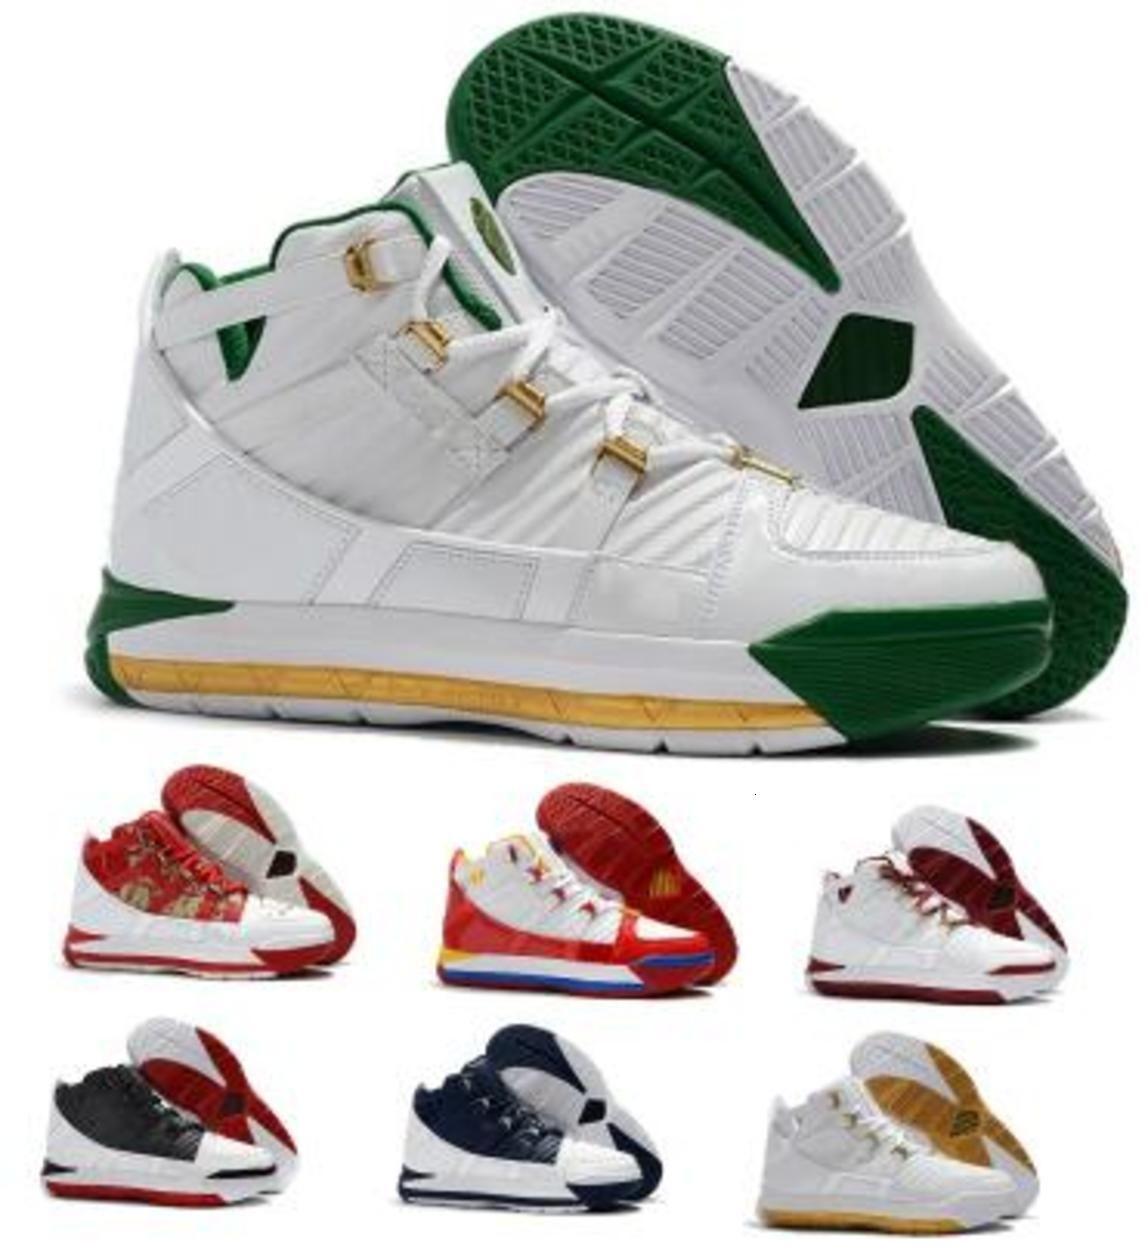 James Soldado 3 3S Superman tênis de basquete Sneakers Zoom SVSM Início Cristo Rei Qs PE meia-noite Mens Ouro Man Zapatilla cestas Sapatos